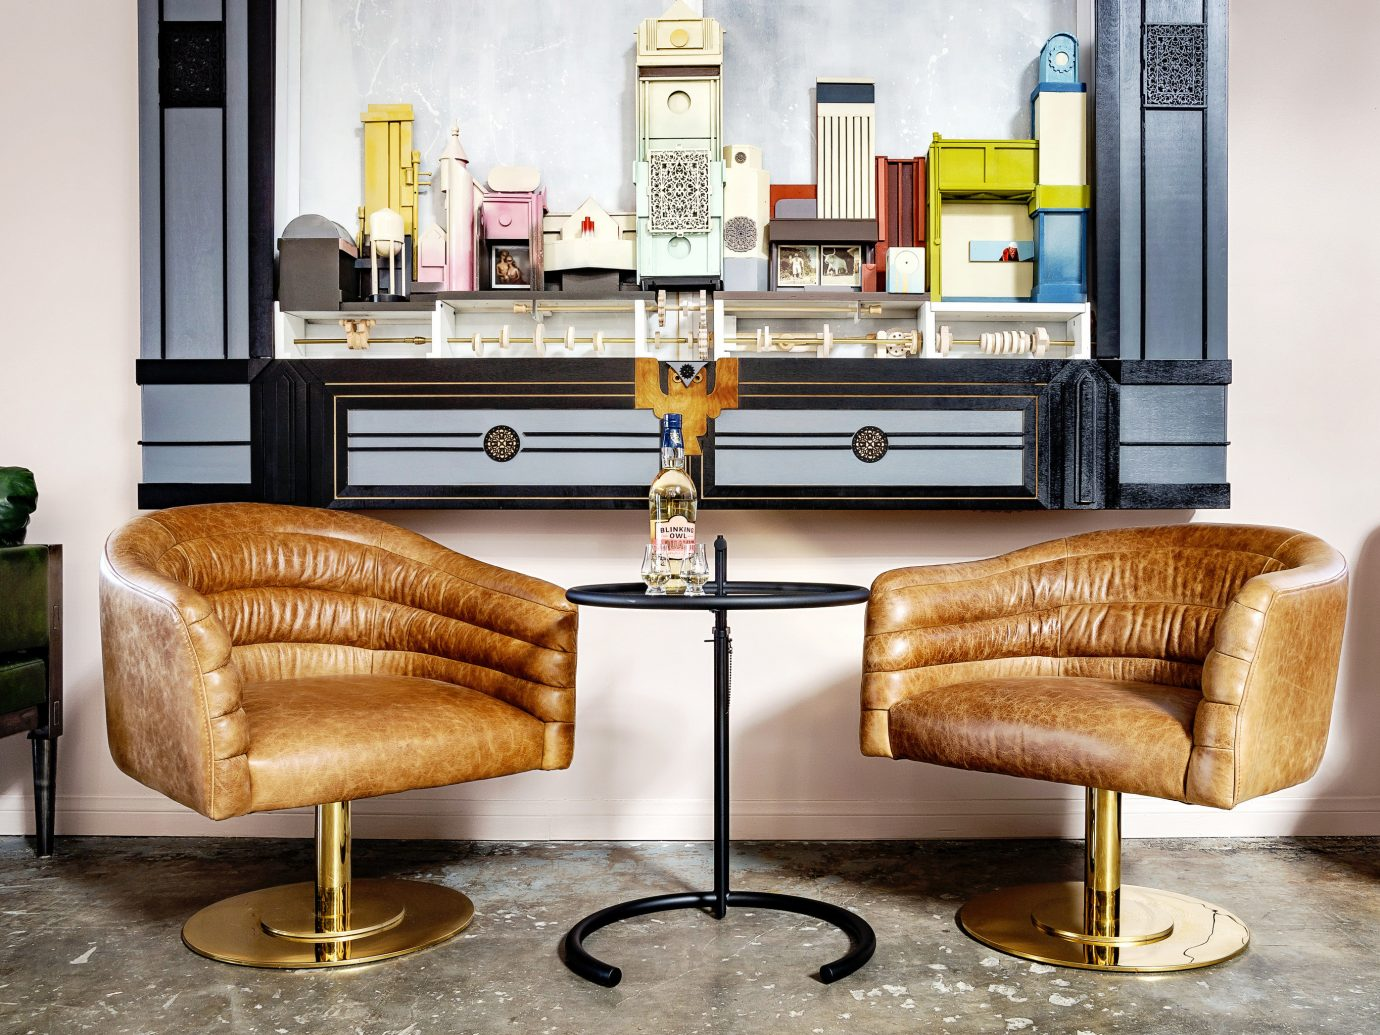 Food + Drink indoor room living room furniture property home table interior design floor Design